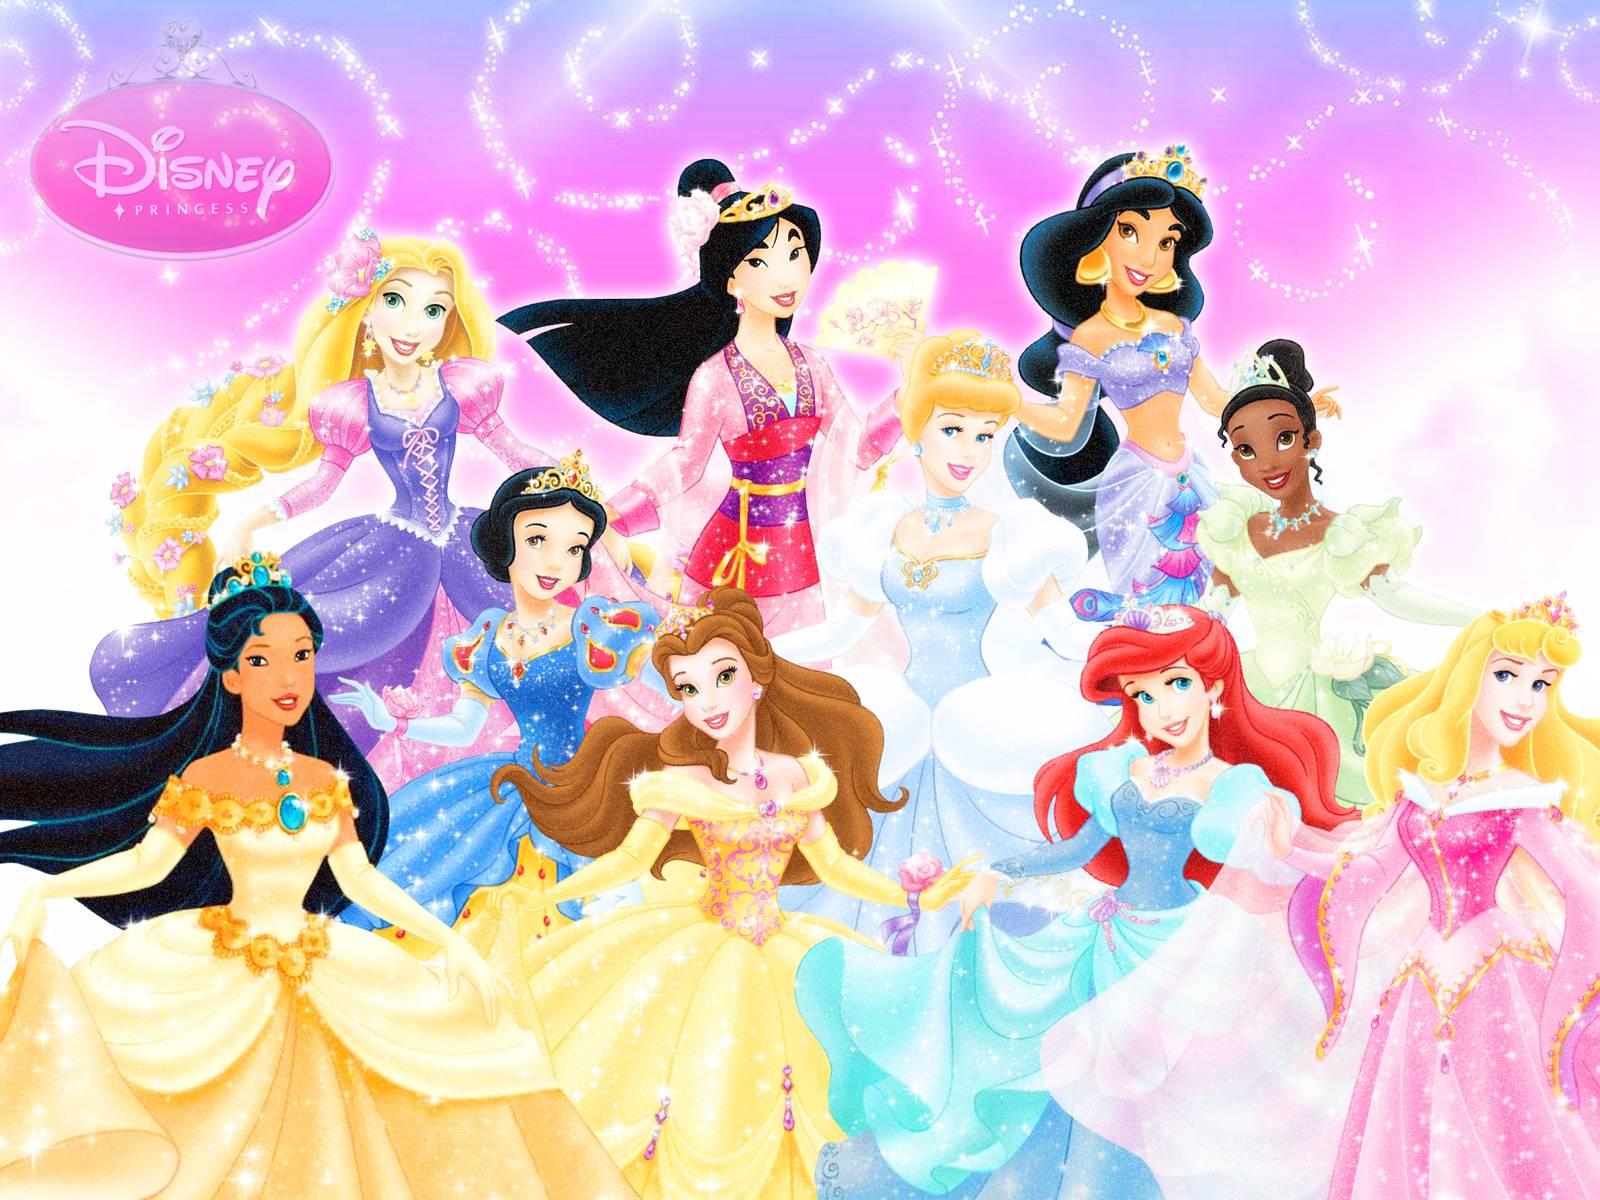 Disney princesses wallpapers wallpaper cave - Image de princesse disney ...